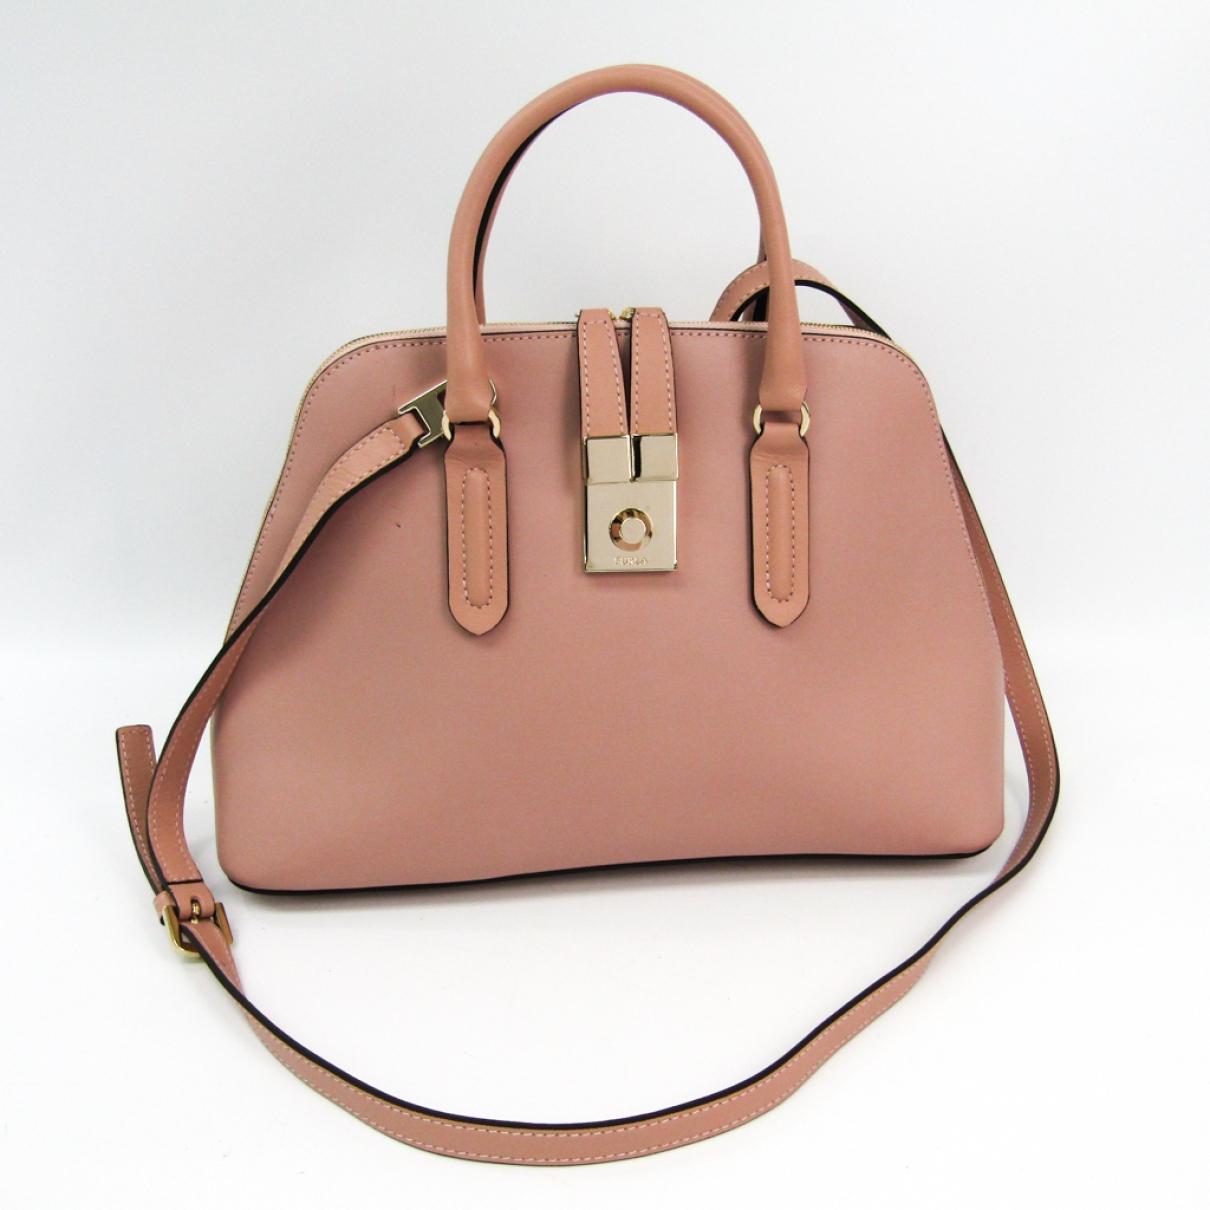 Furla \N Pink Leather handbag for Women \N